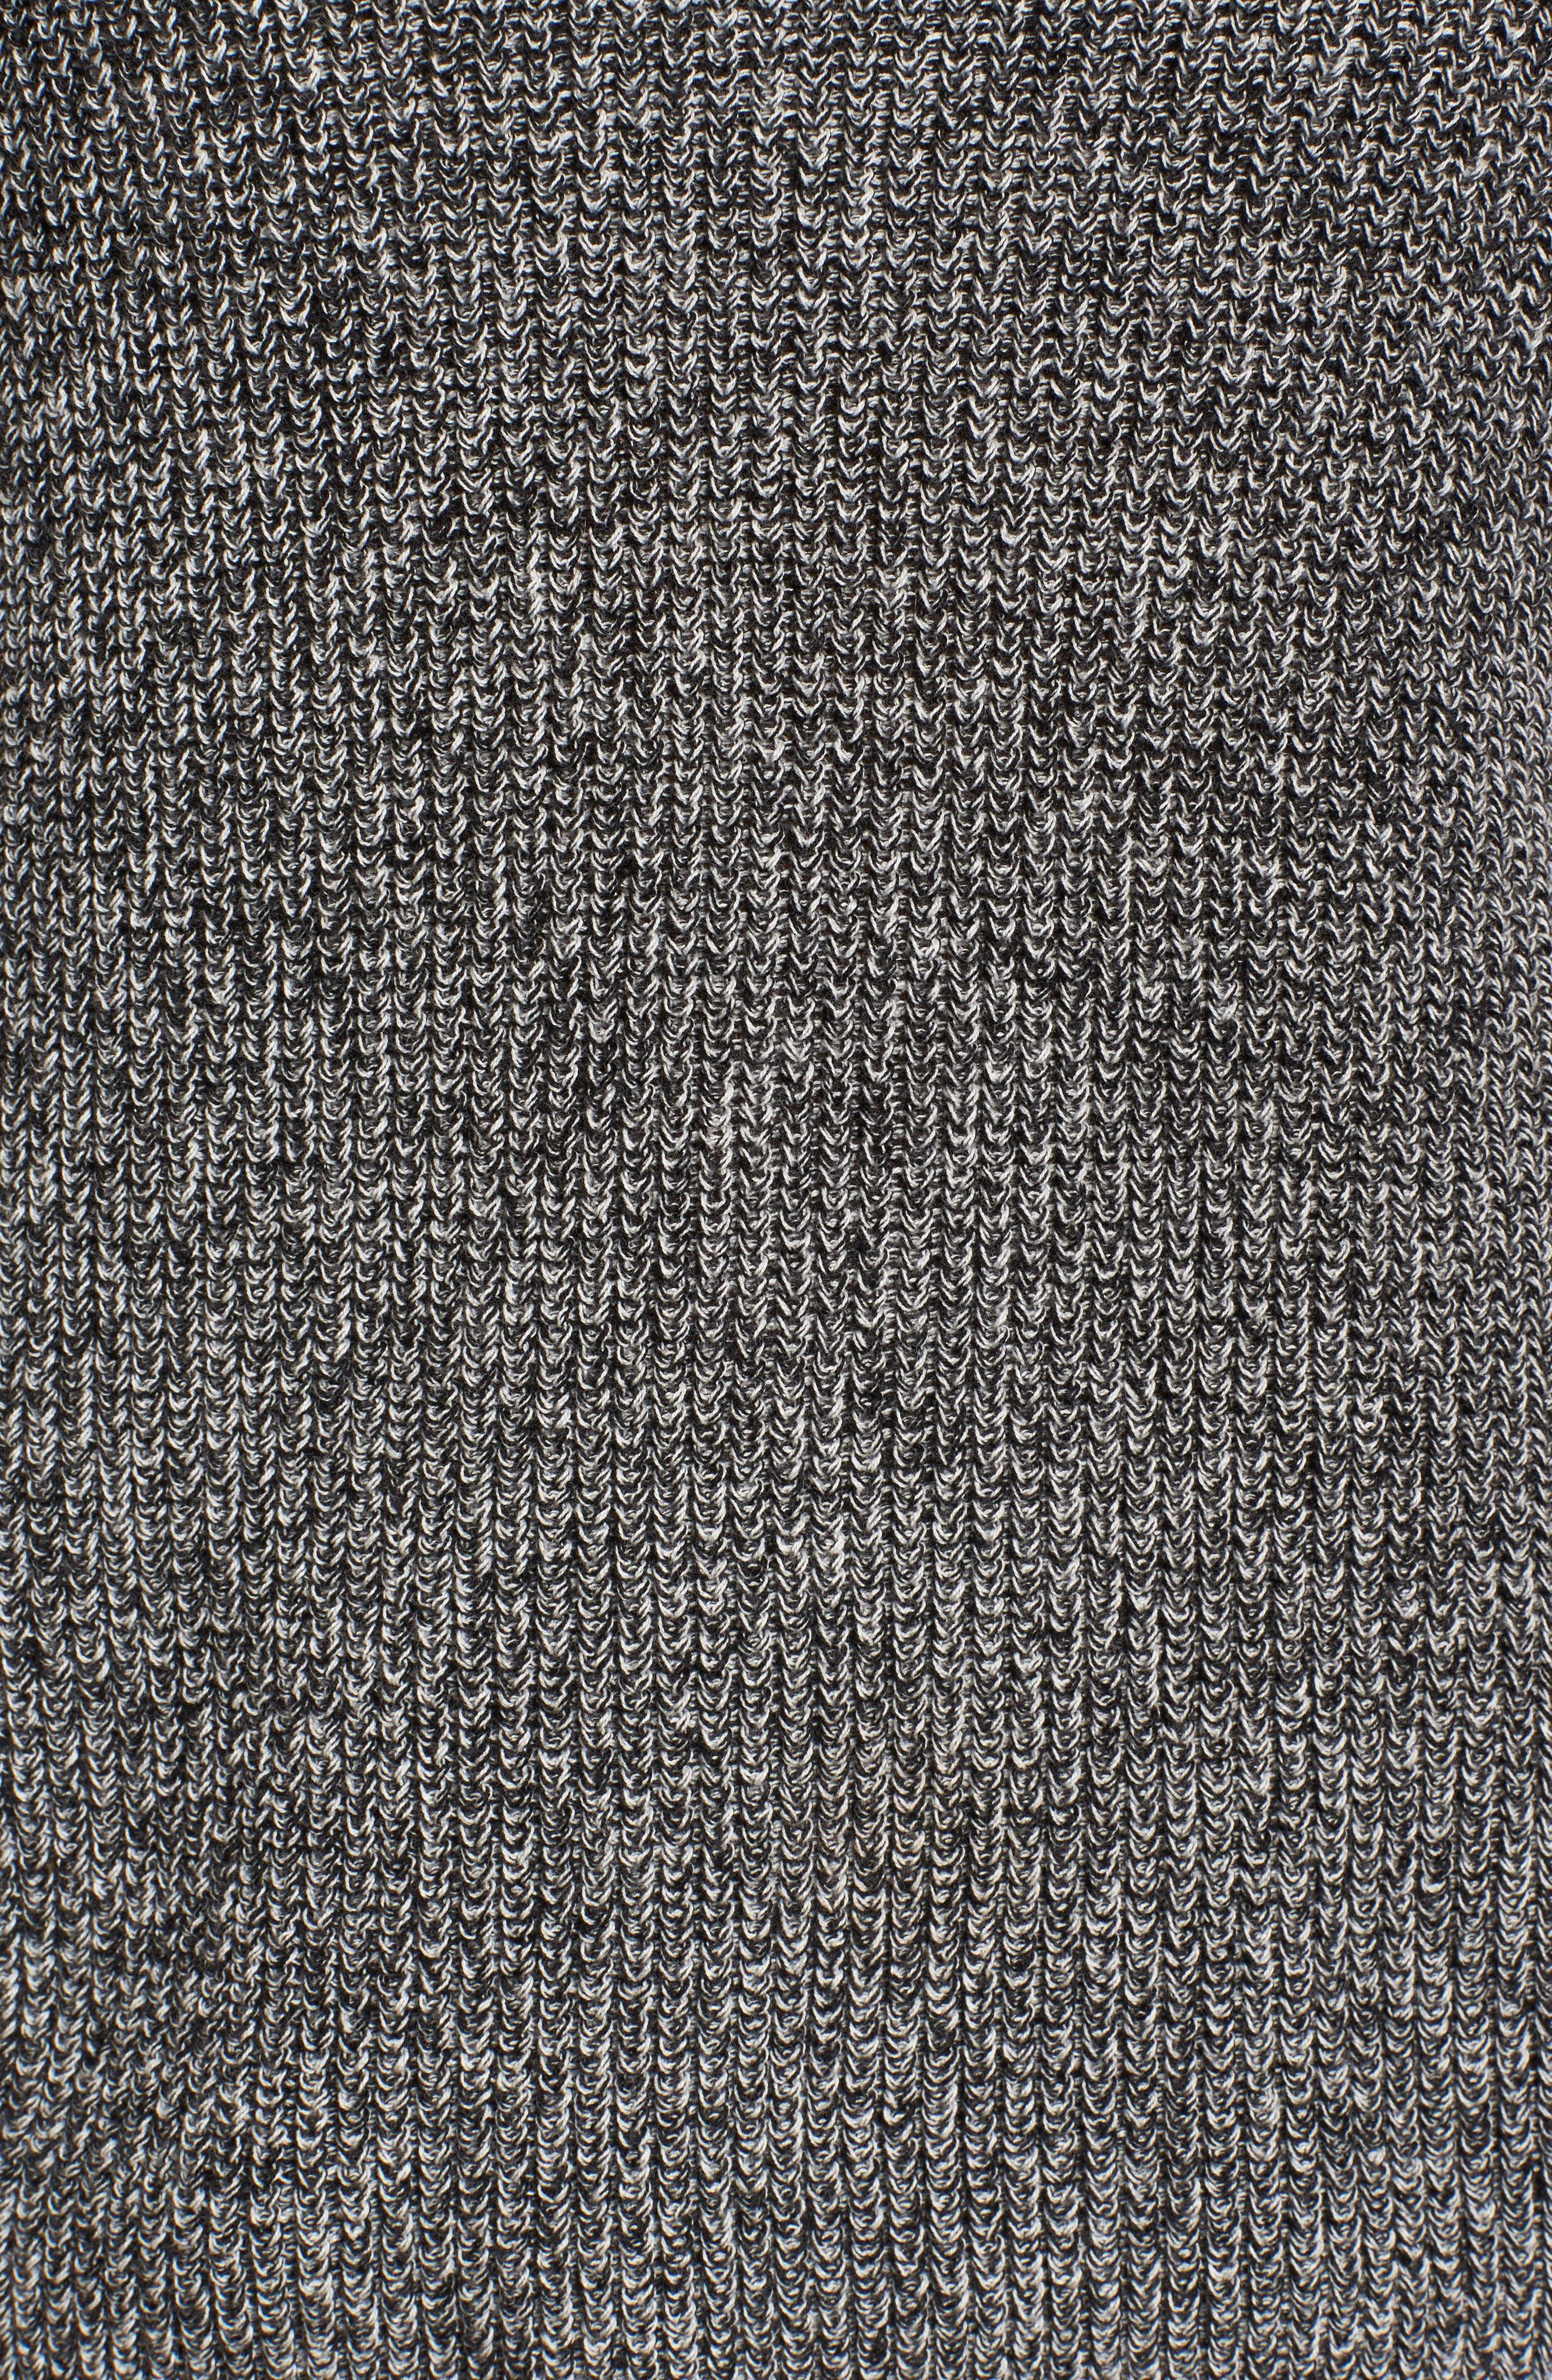 Alternate Image 5  - rag & bone/JEAN Dana Cold Shoulder Sweater